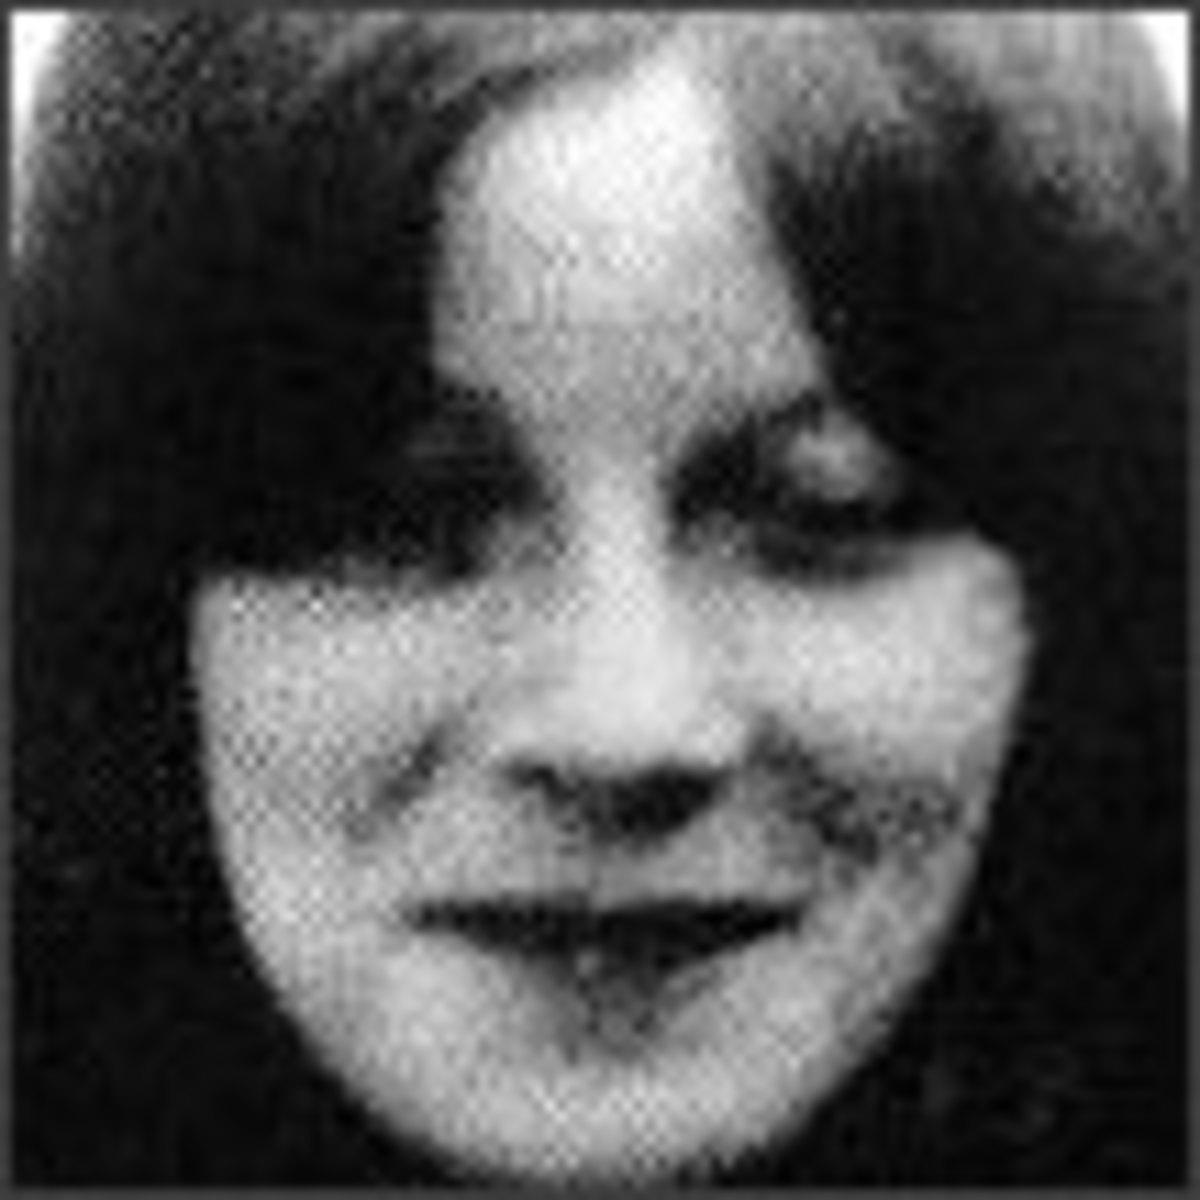 Anna McFall, first known victim